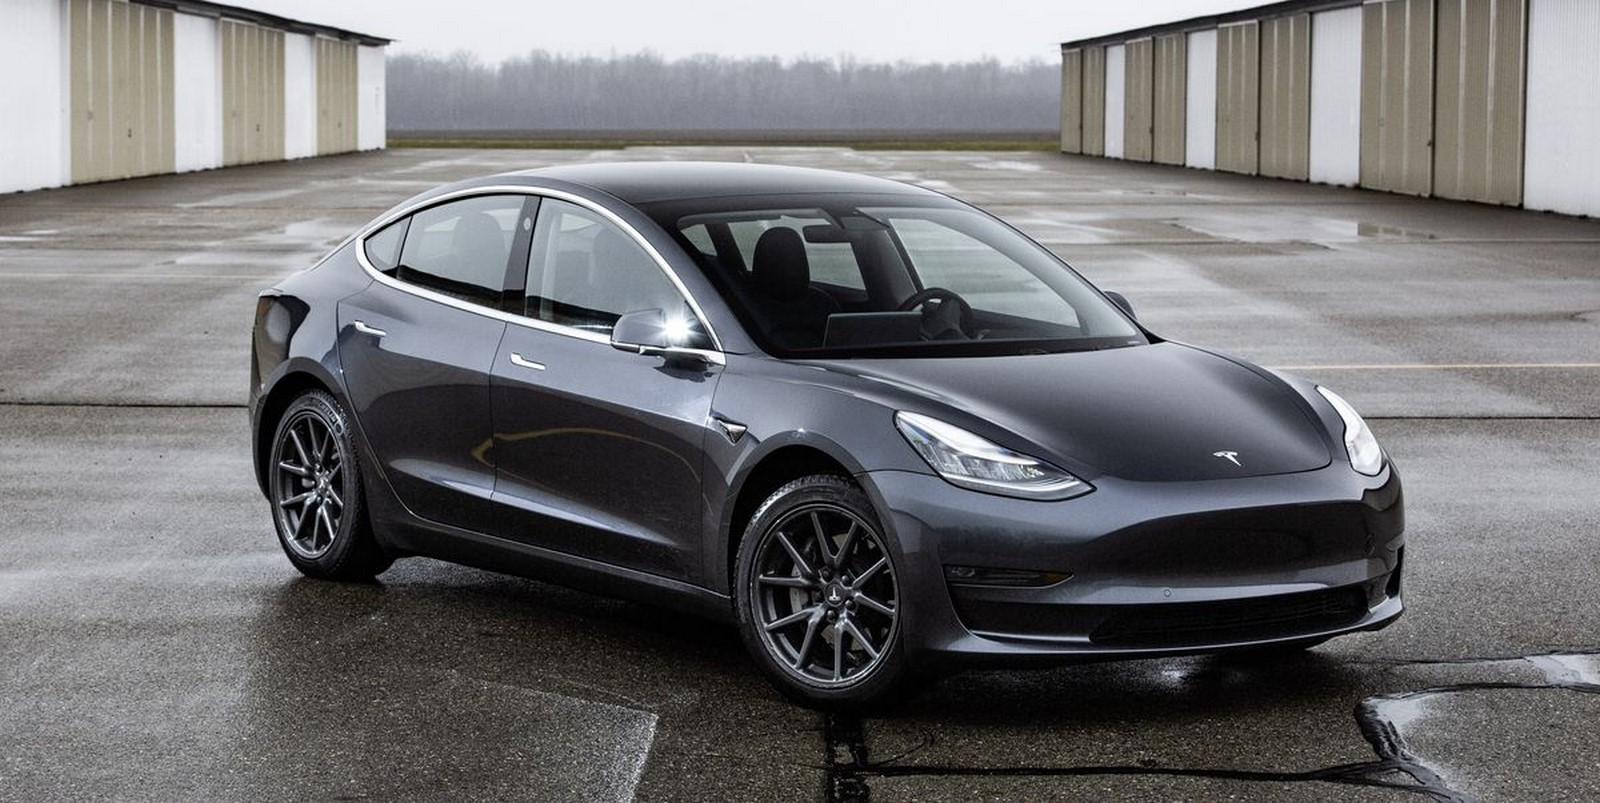 The Unorthodox Design of Tesla - Sheet4